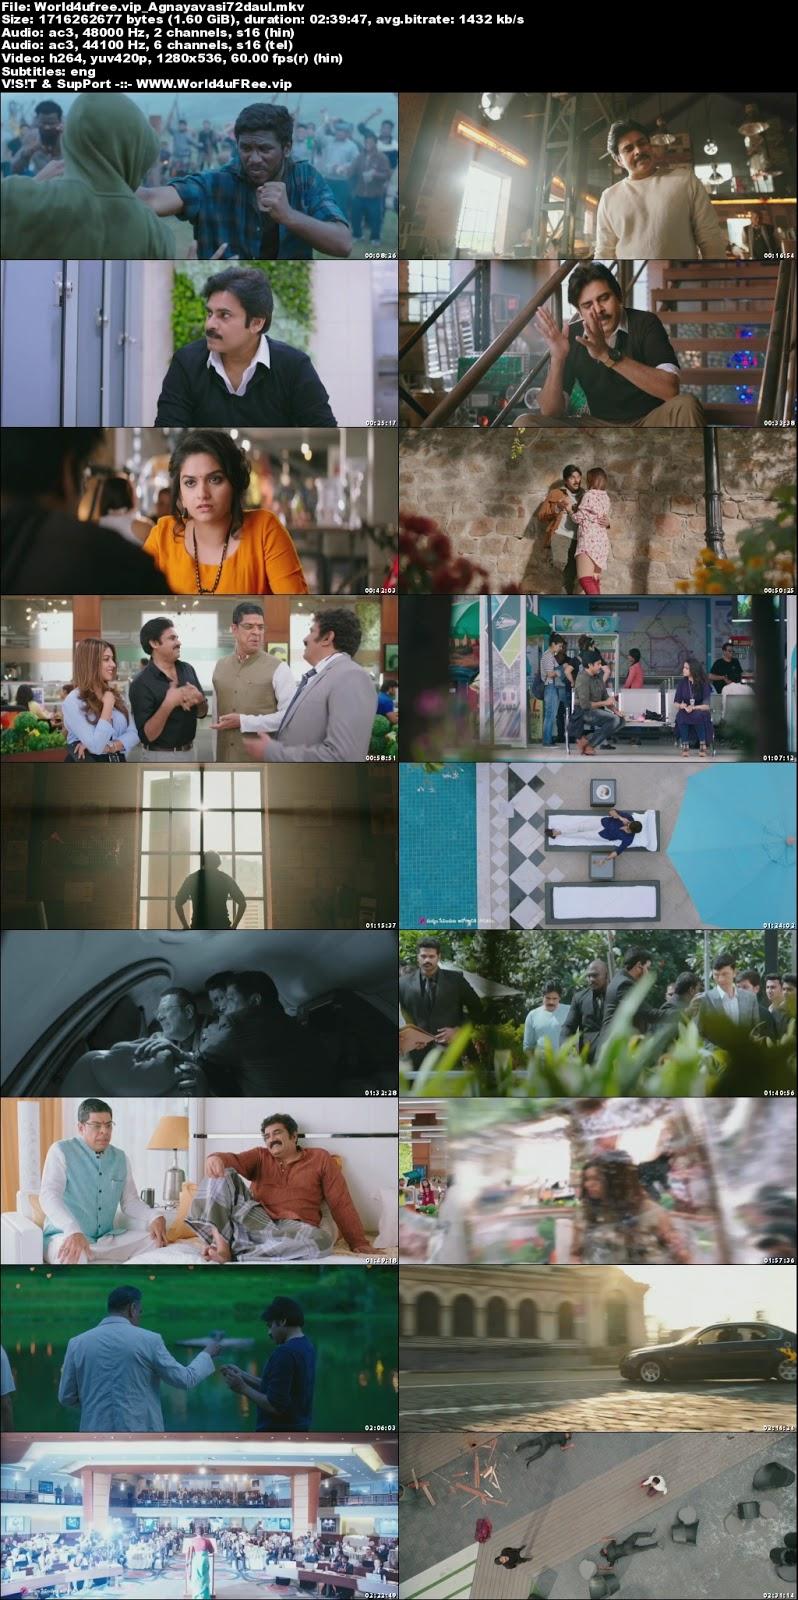 Agnyaathavaasi 2018 Dual Audio 720p UNCUT HDRip Download world4ufree.vip , South indian movie Agnyaathavaasi 2018 hindi dubbed world4ufree.vip 720p hdrip webrip dvdrip 700mb brrip bluray free download or watch online at world4ufree.vip